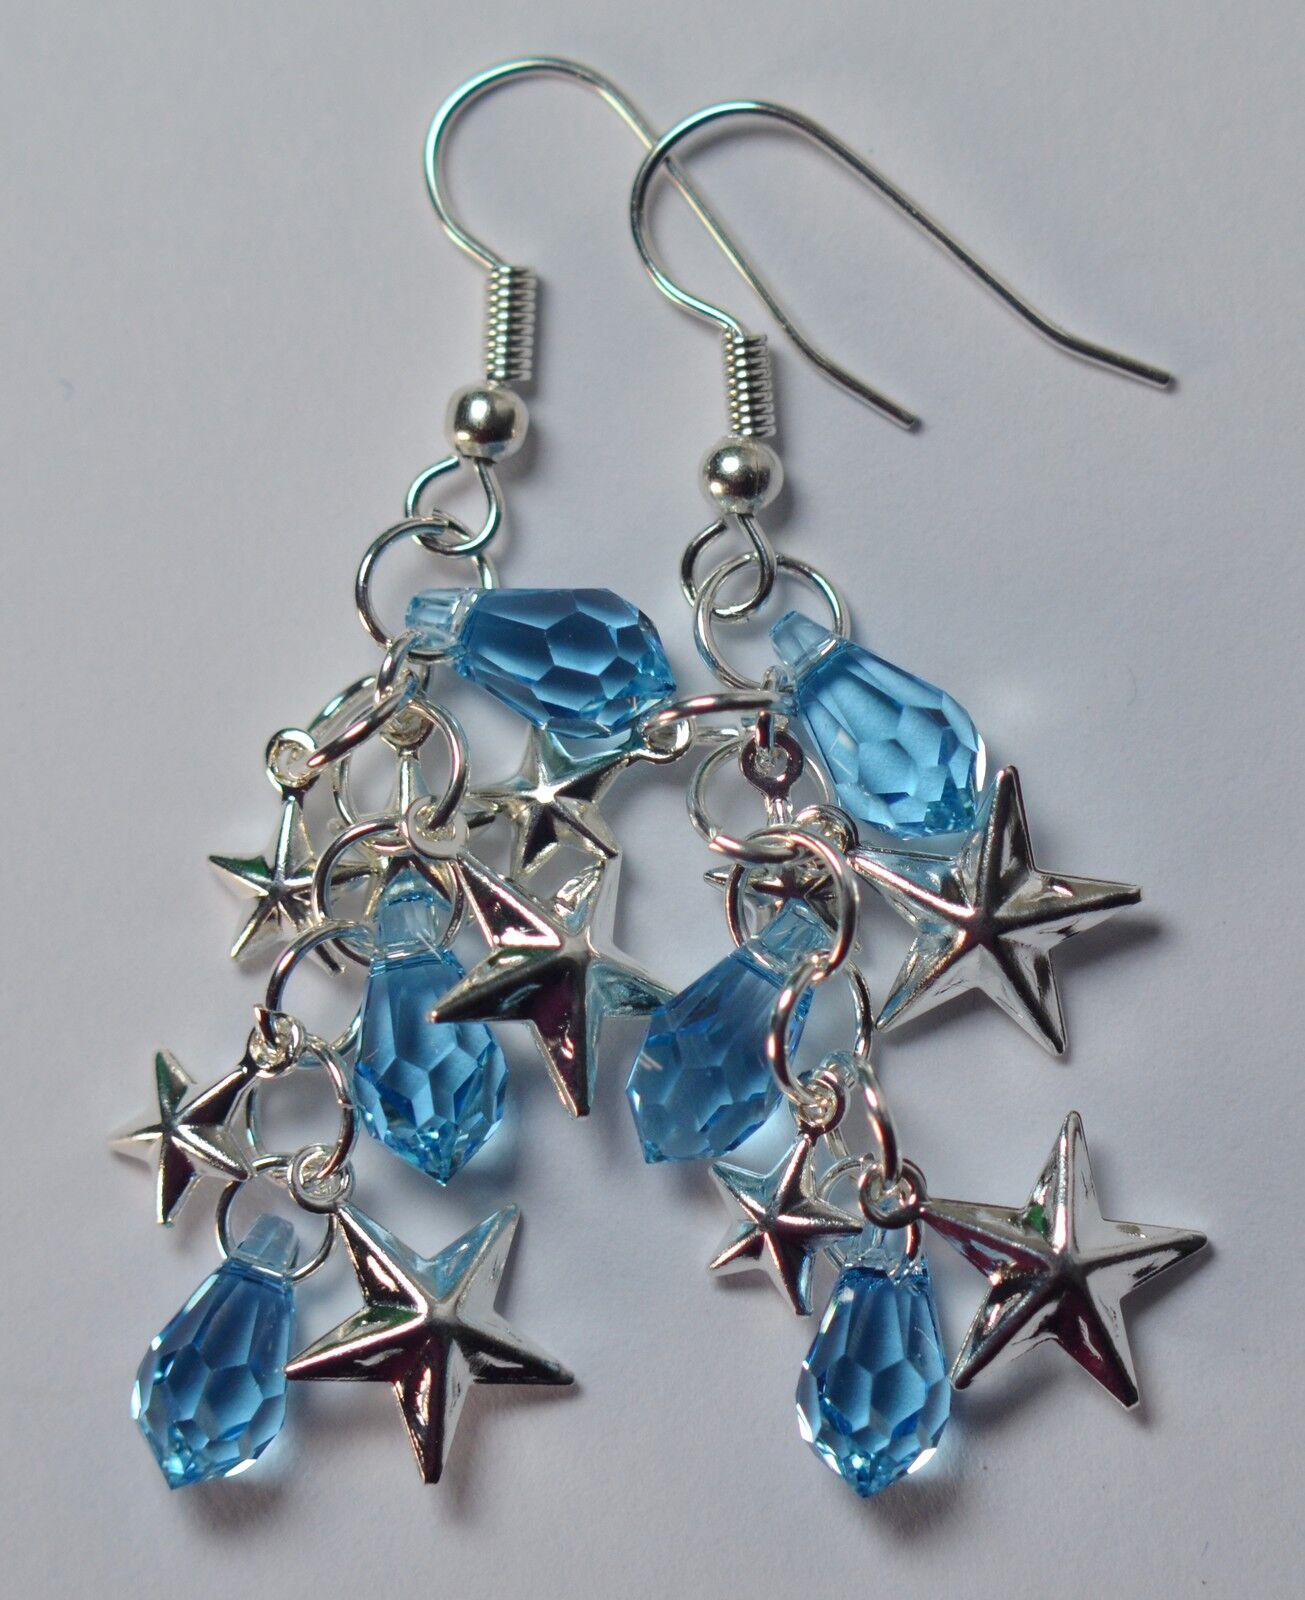 Linda s Cabs Jewelry and Gemstones